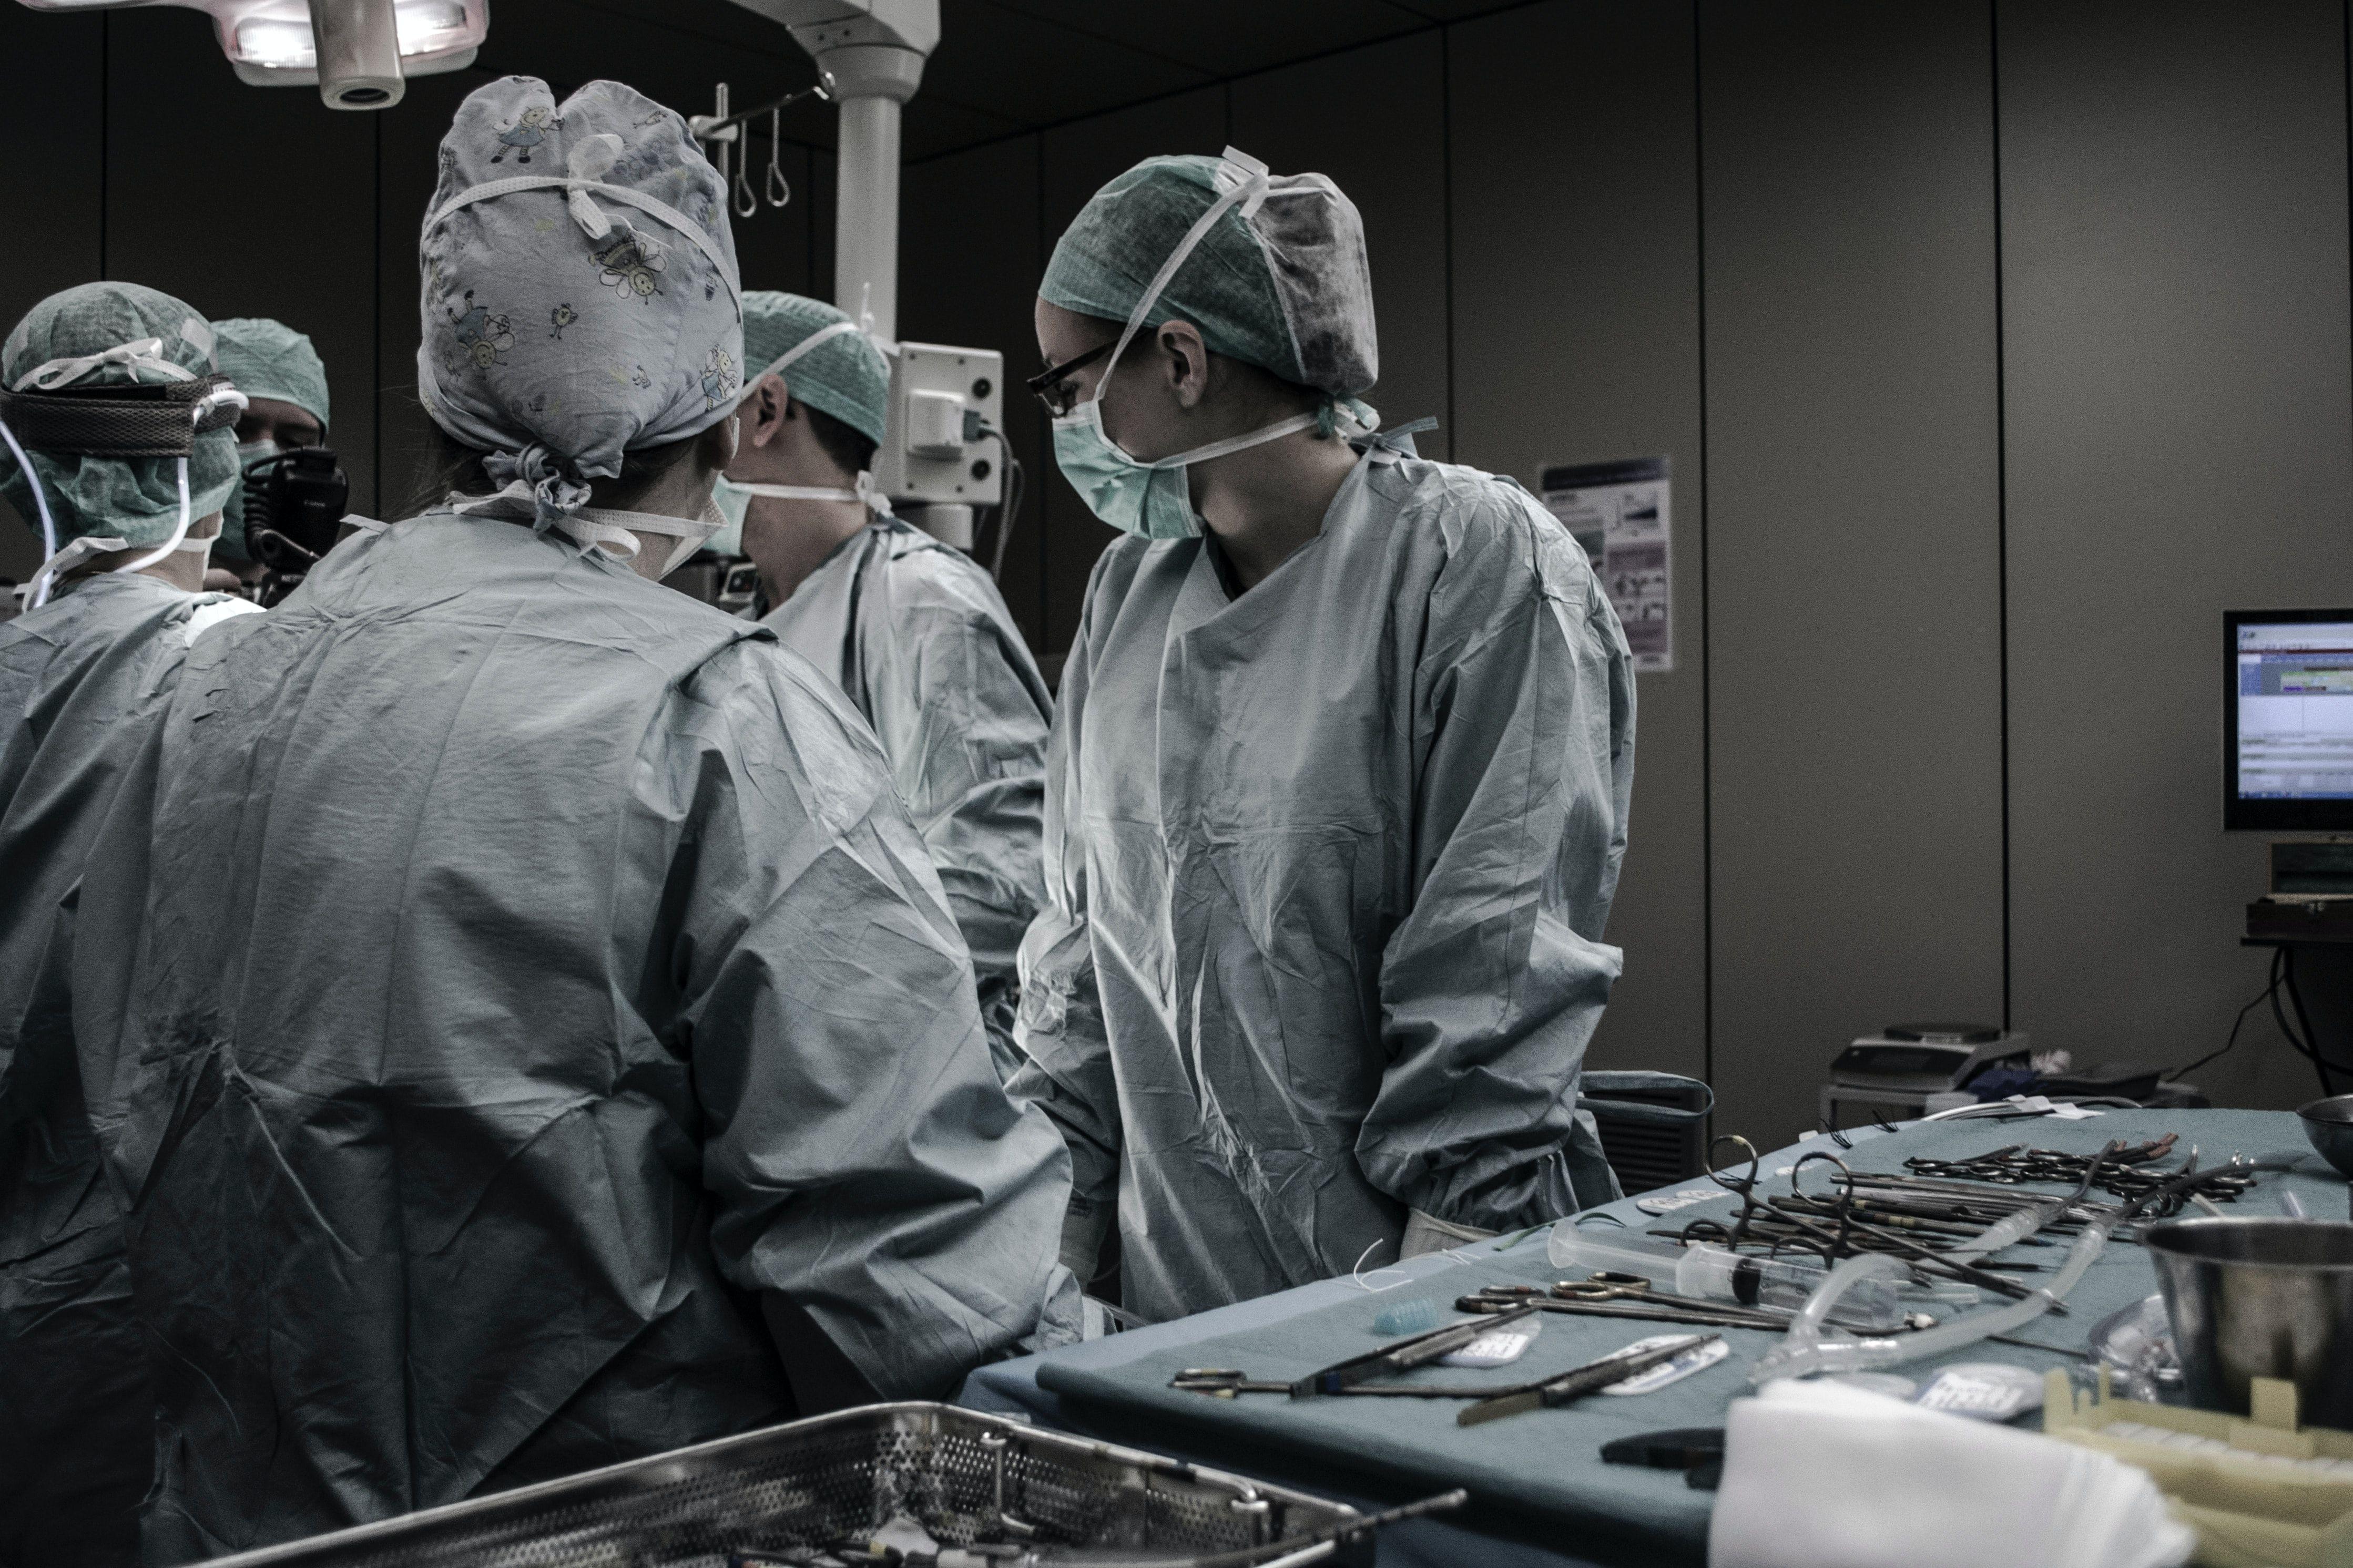 /digitizing-canadian-healthcare-cim3usy feature image